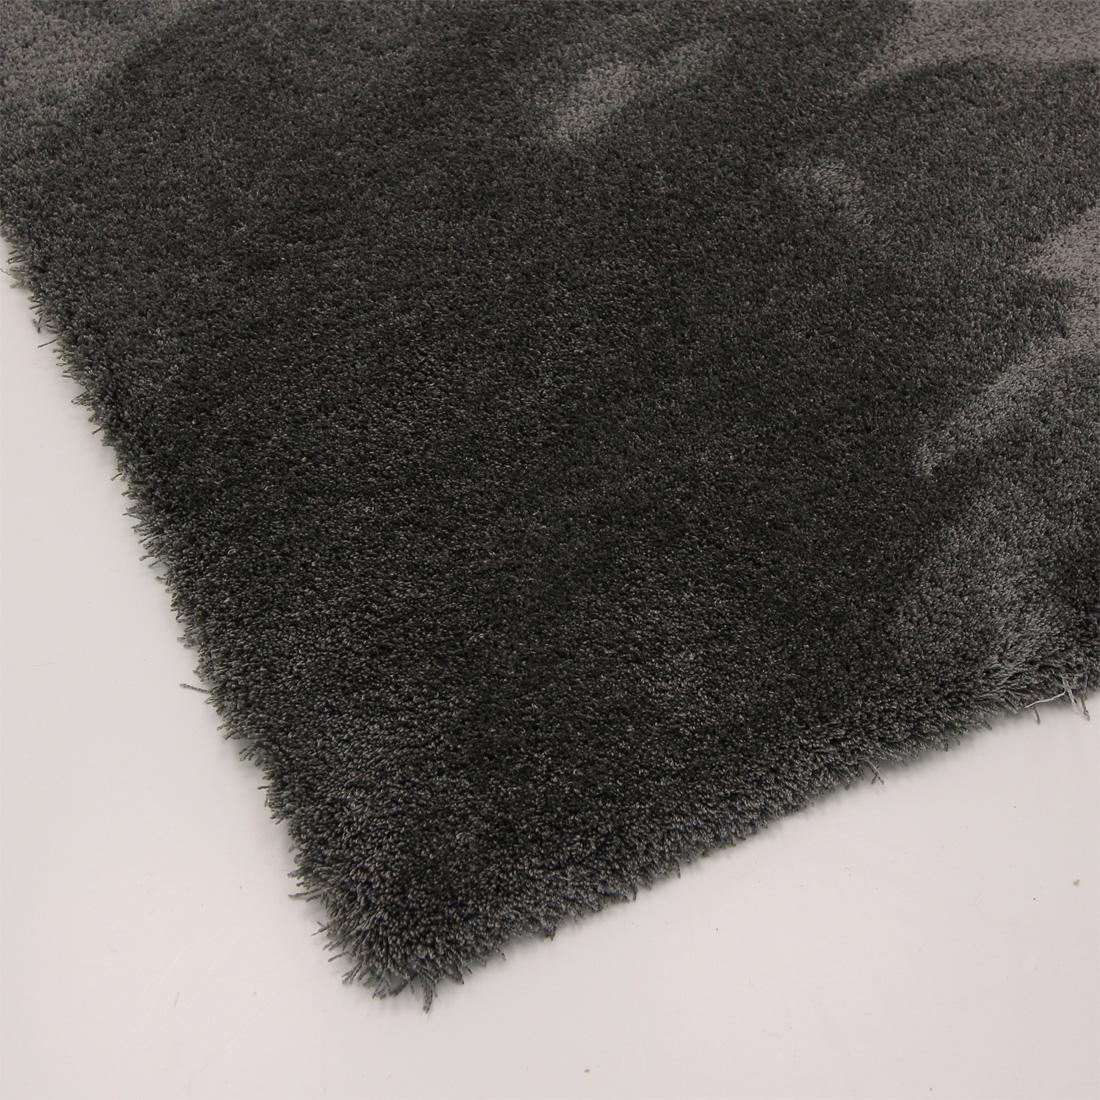 Vloerkleed Xilento Silky Soft Antraciet | 200 x 300 cm